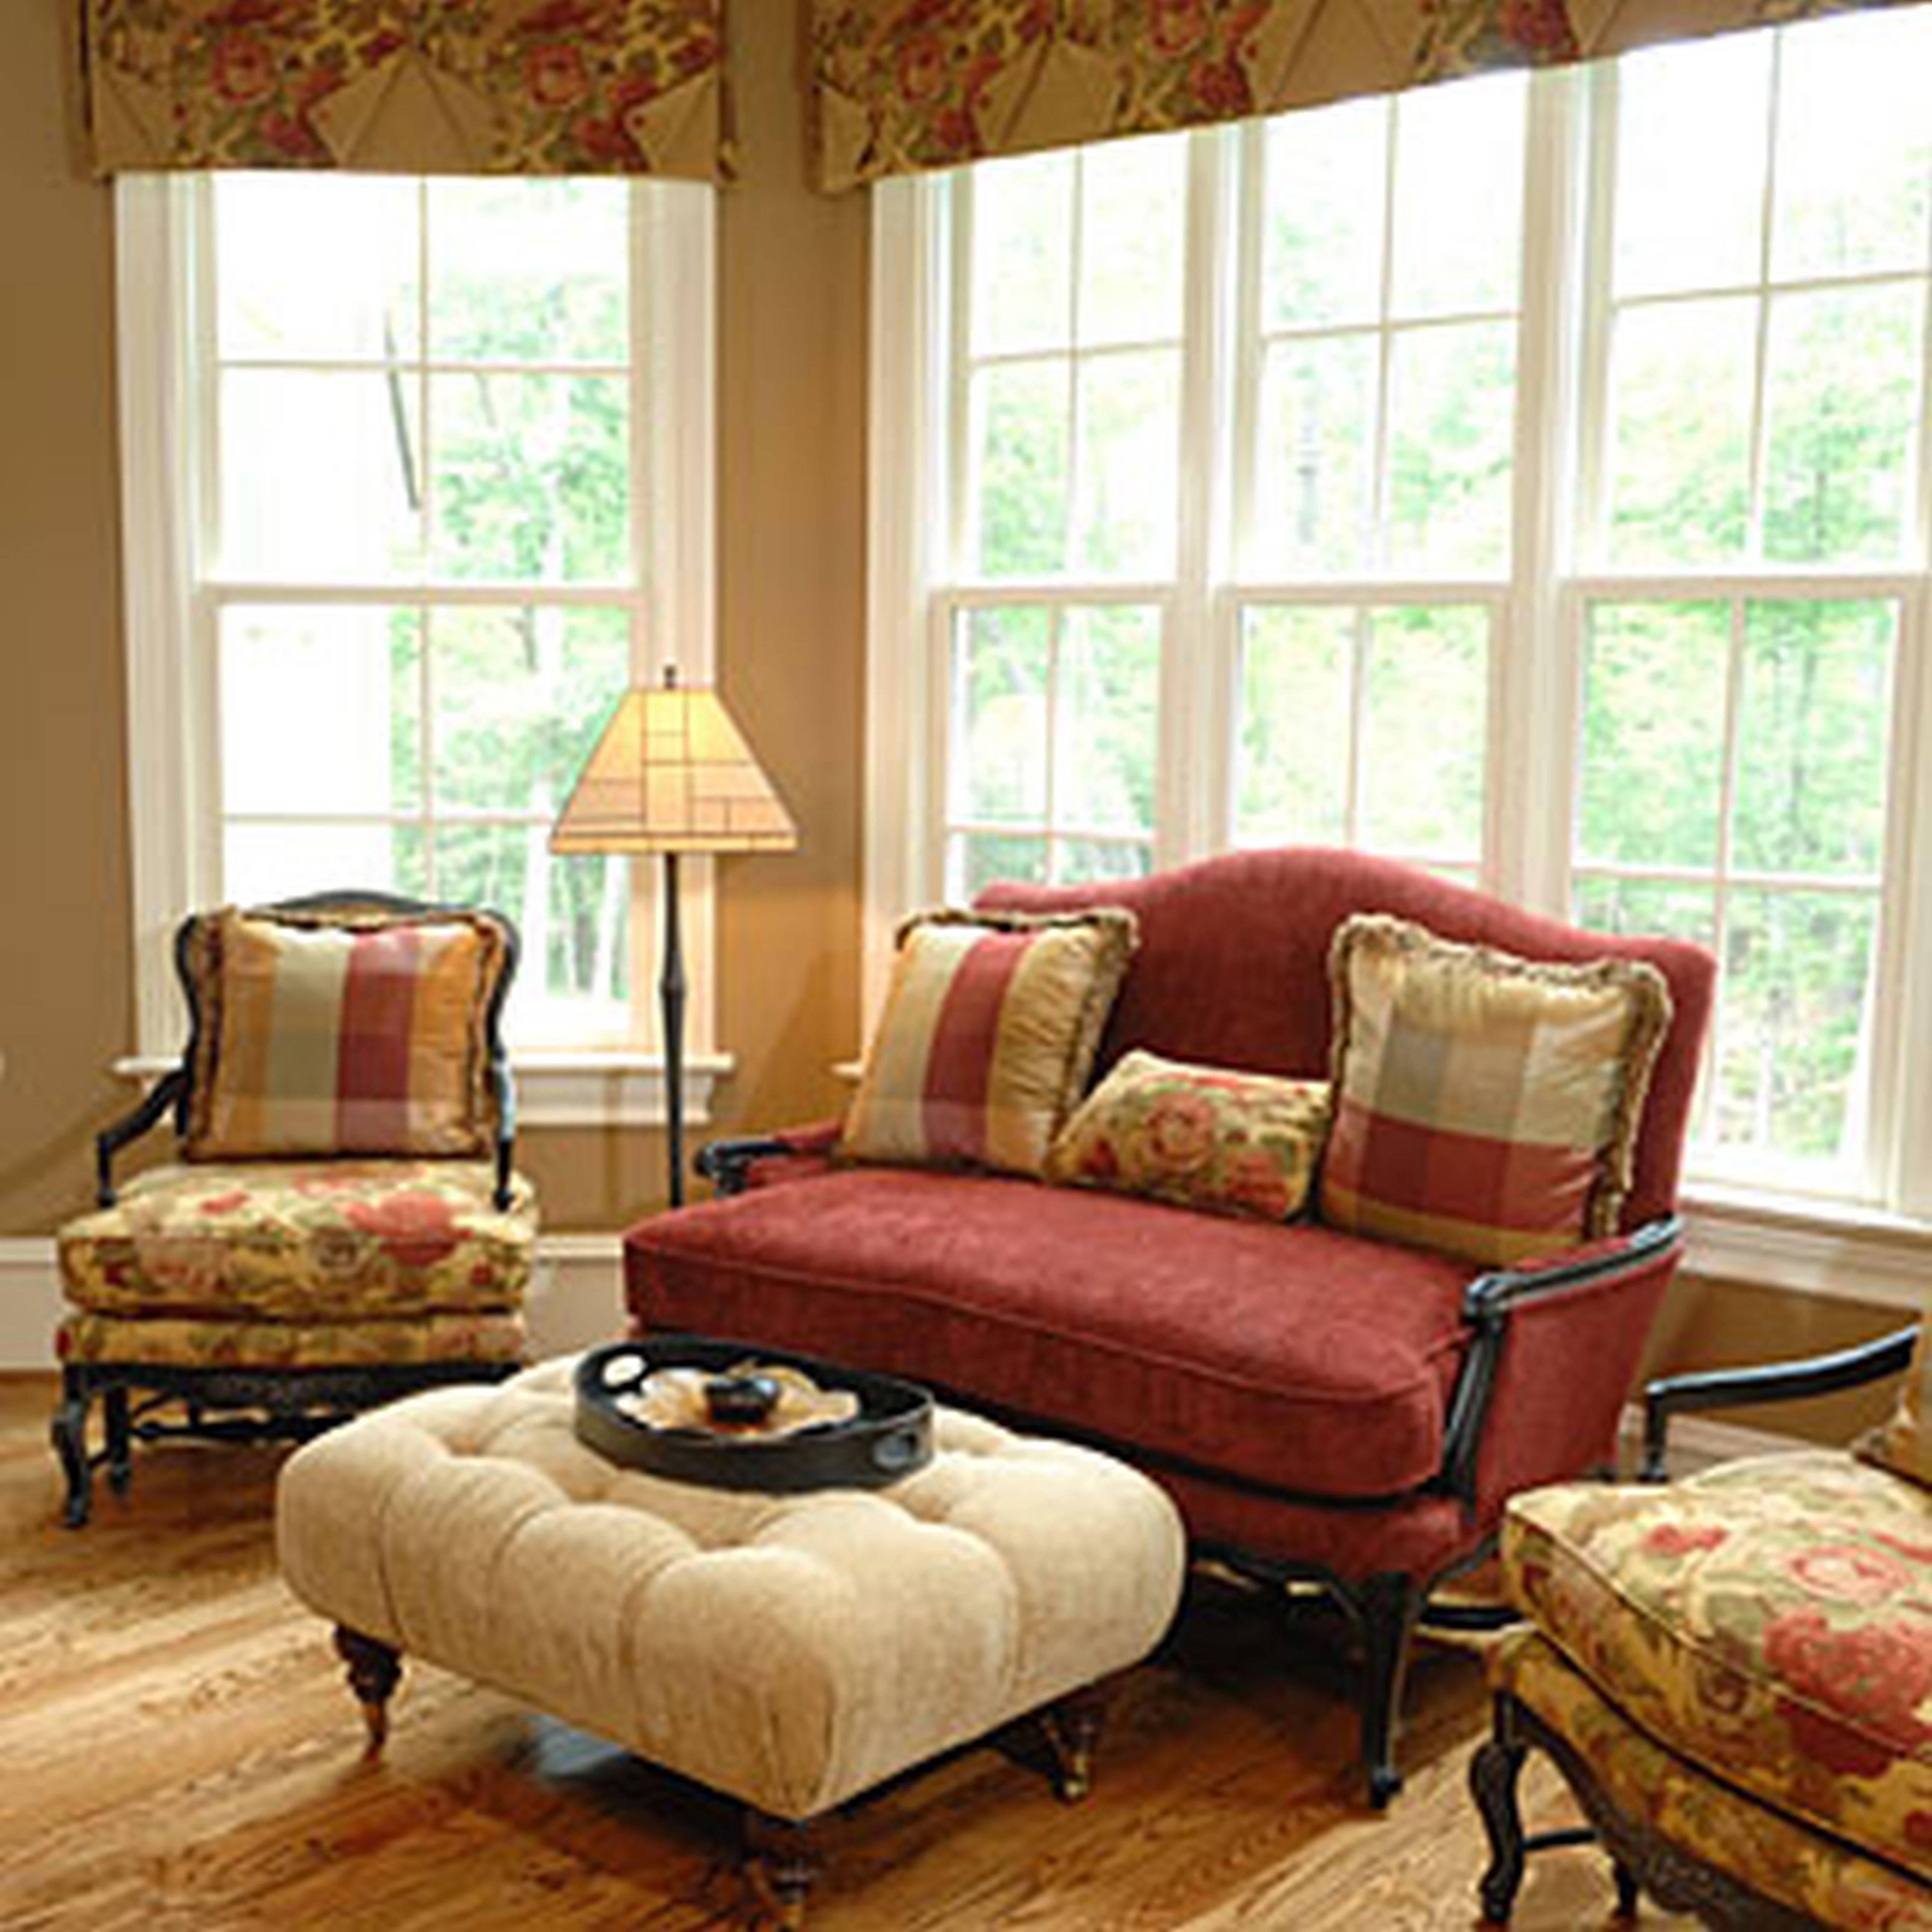 2017 Latest Cream Colored Sofa